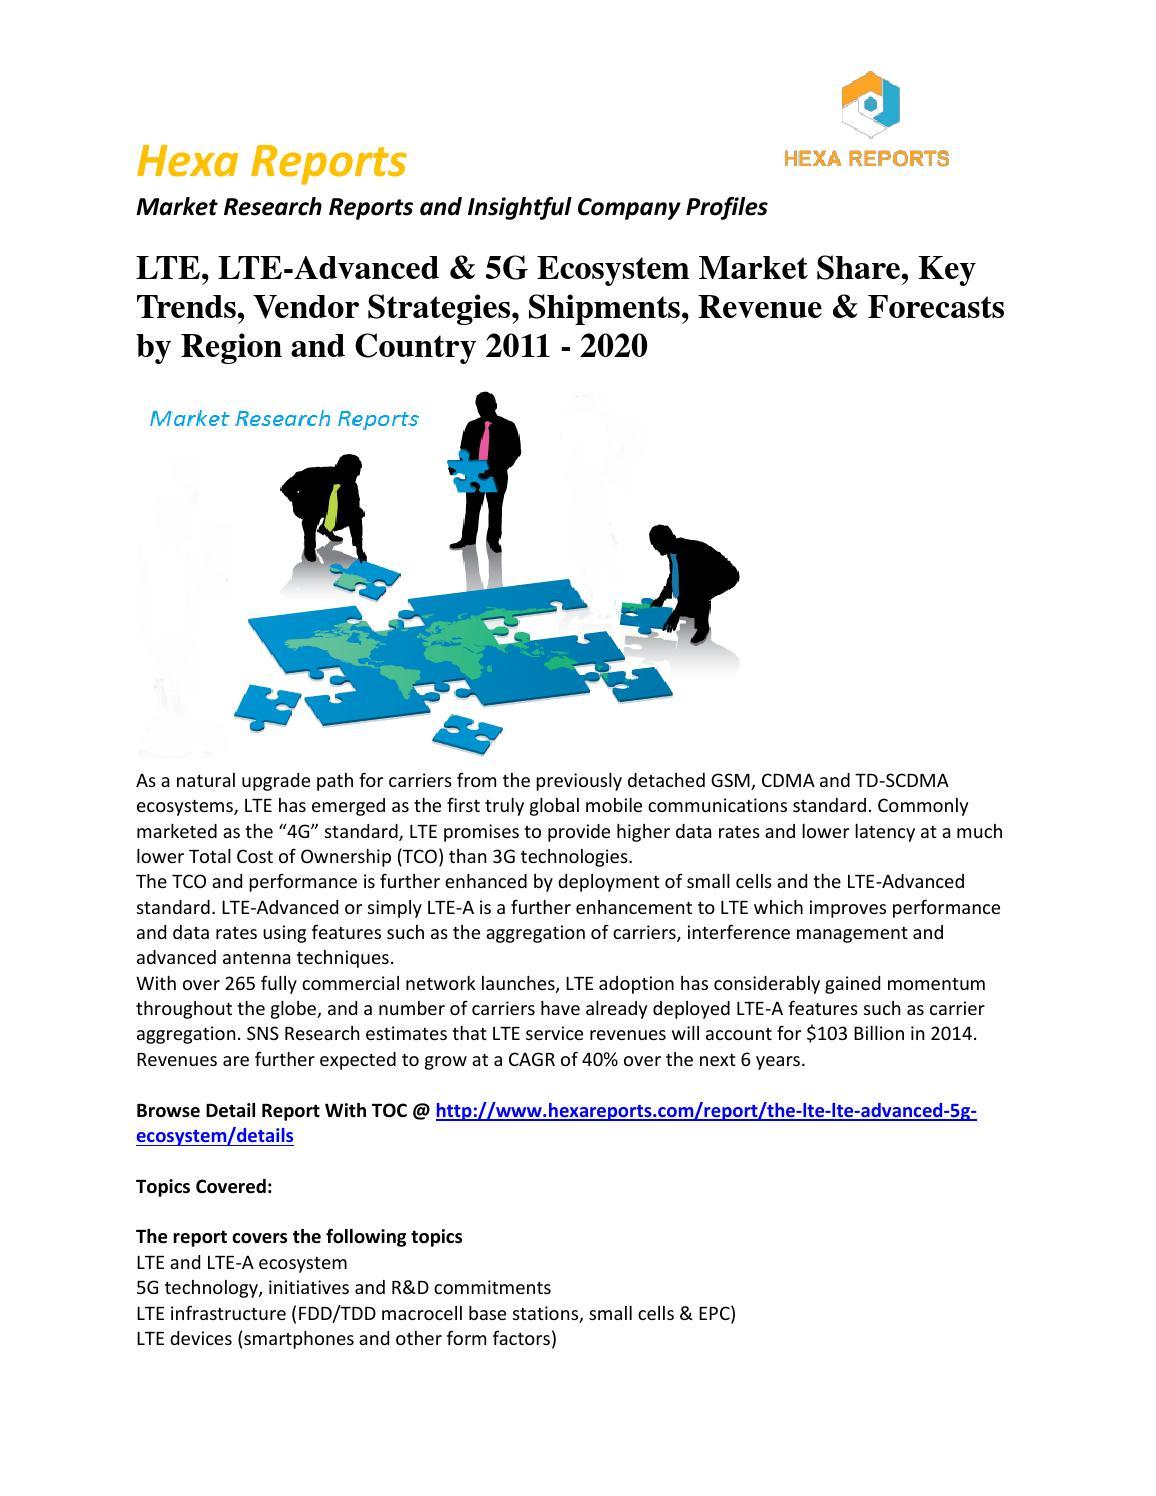 Lte, lte advanced & 5g ecosystem market share, key trends